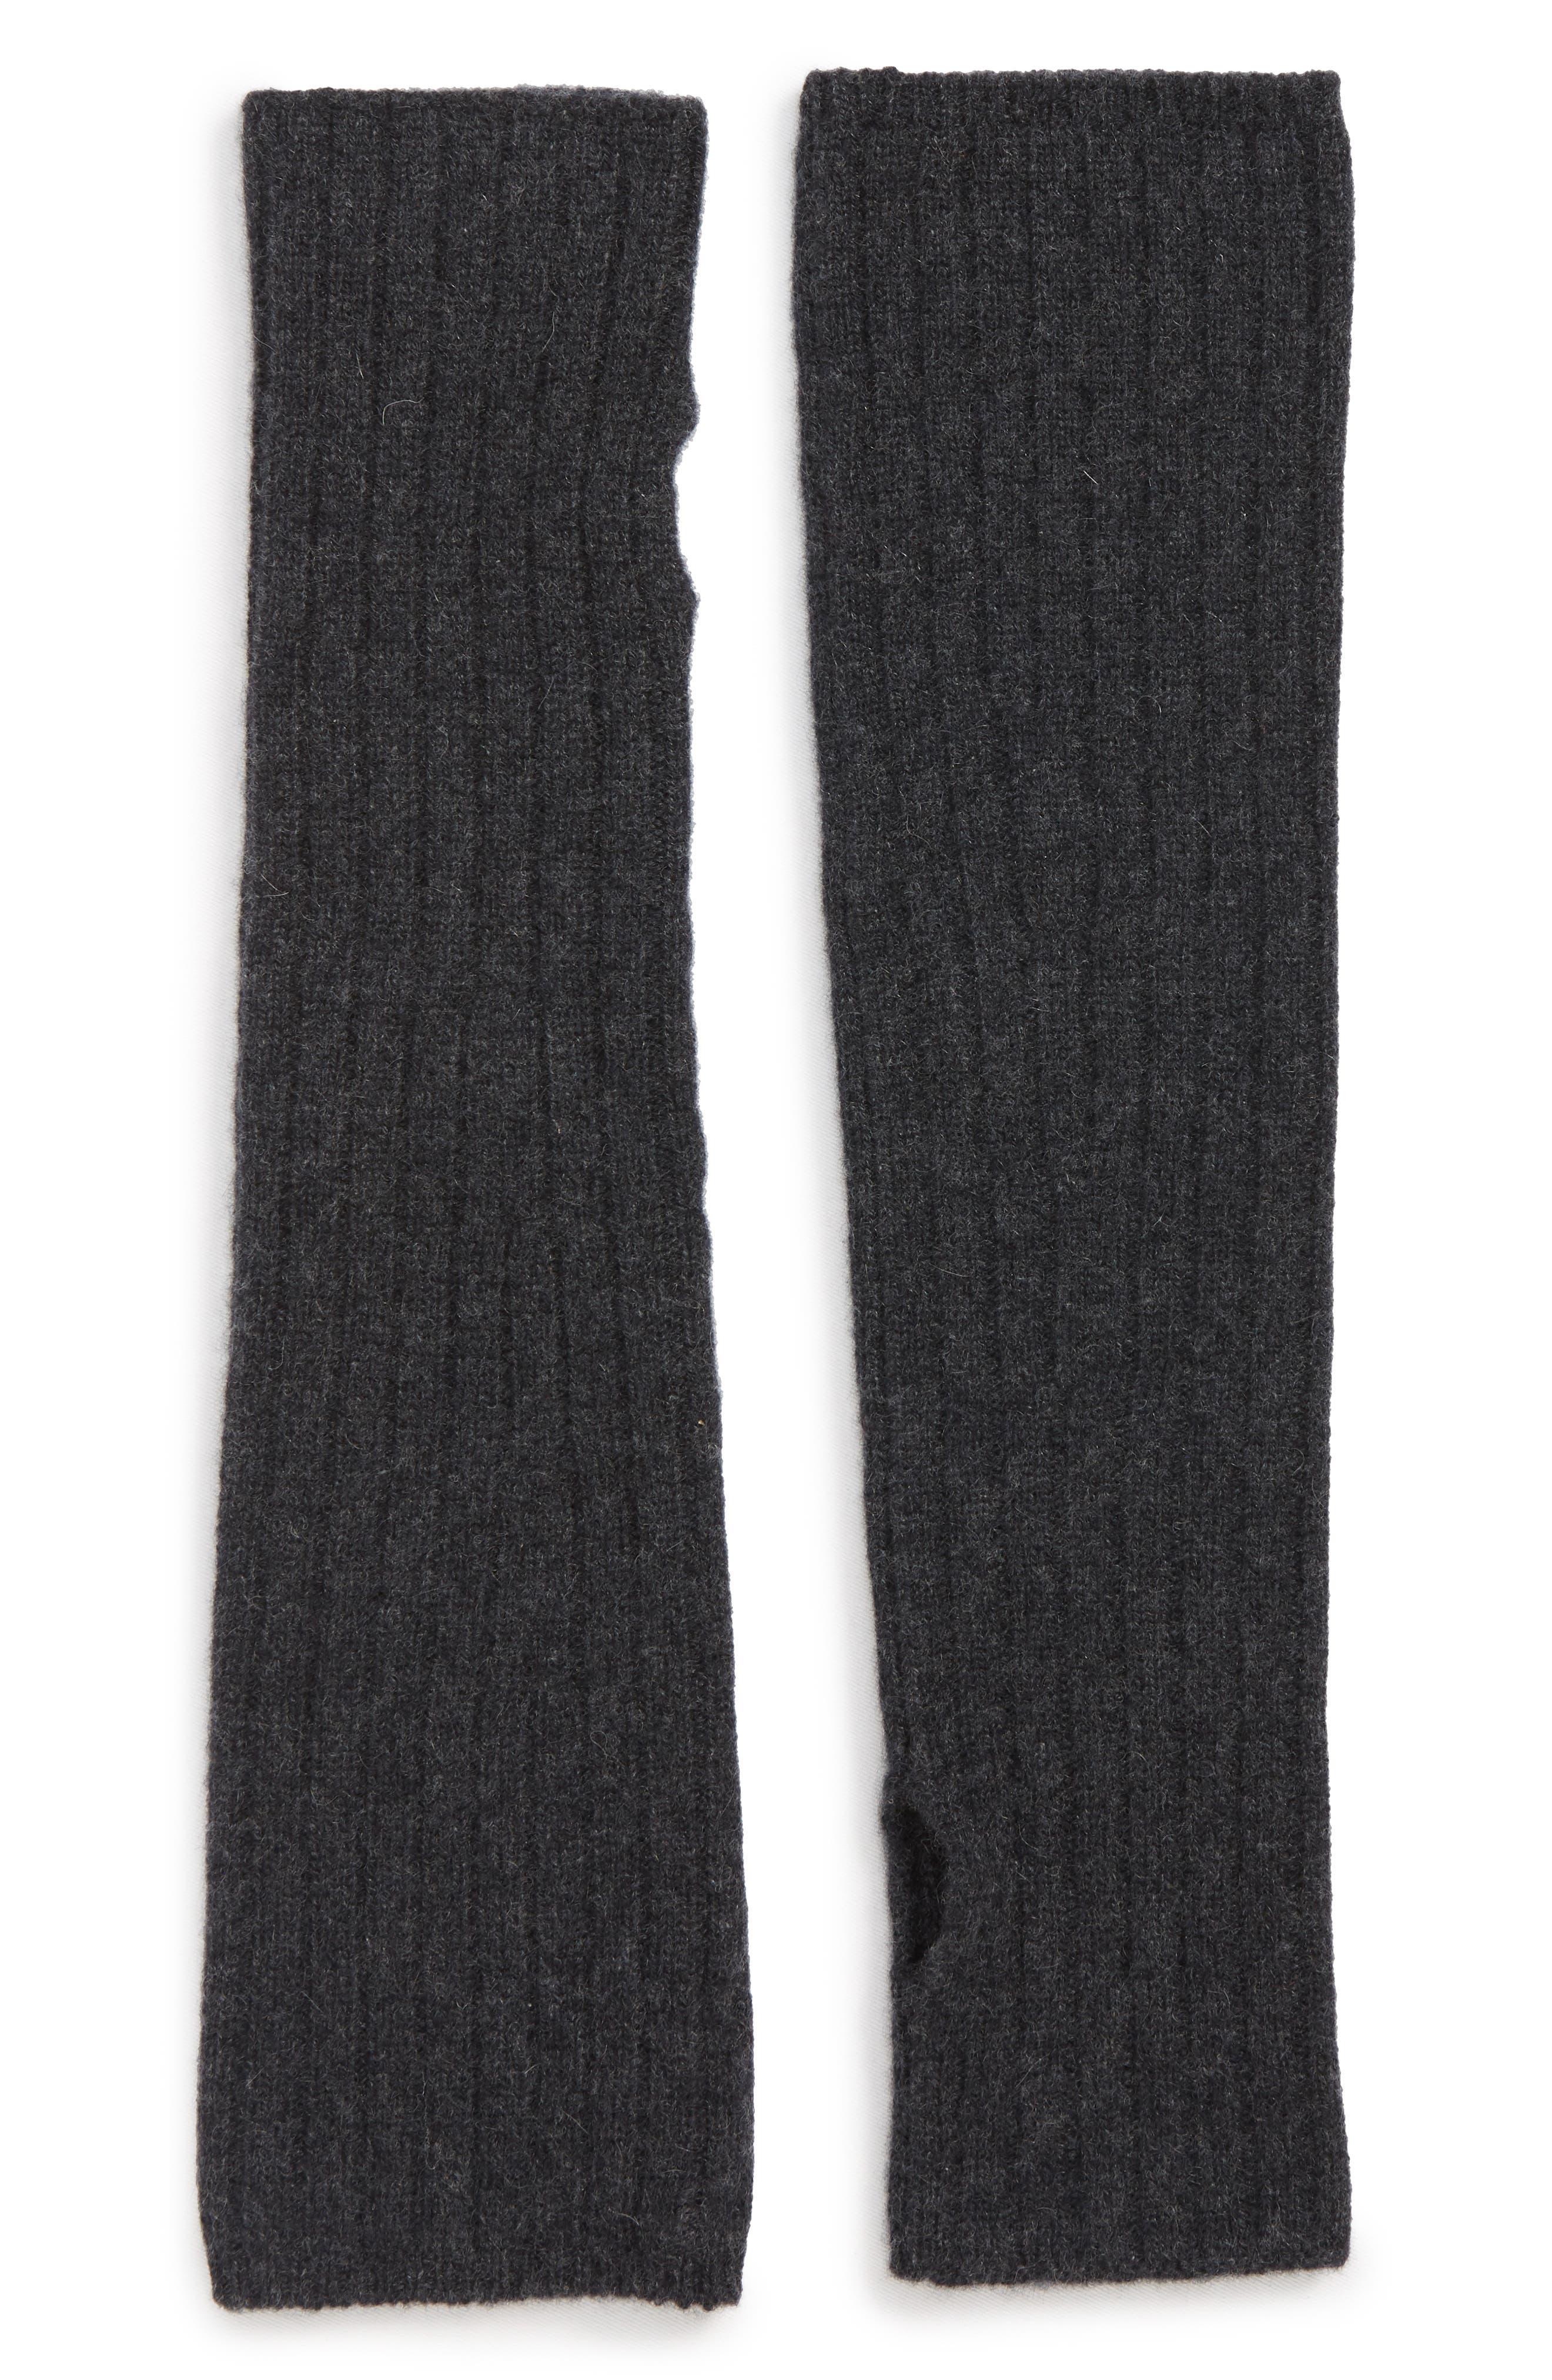 Cashmere Arm Warmer,                         Main,                         color, BLACK ROCK HEATHER